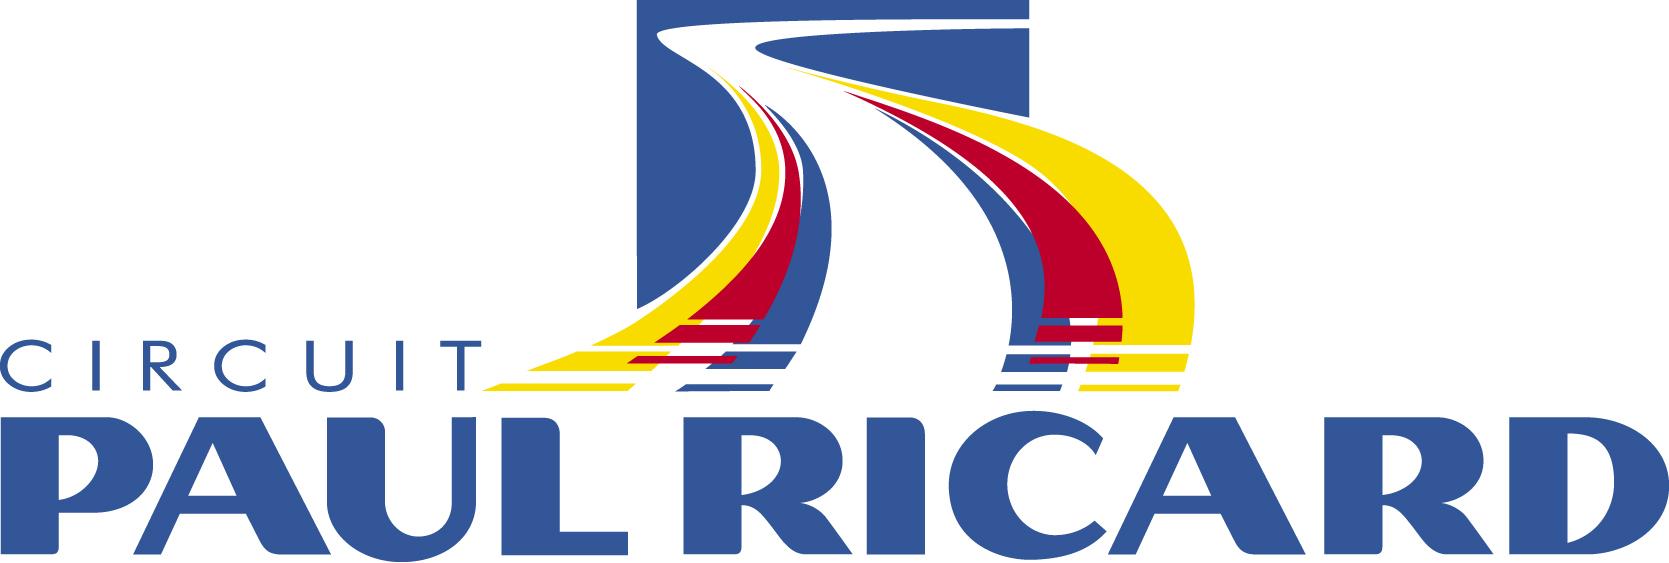 logo-circuit-paul-ricard